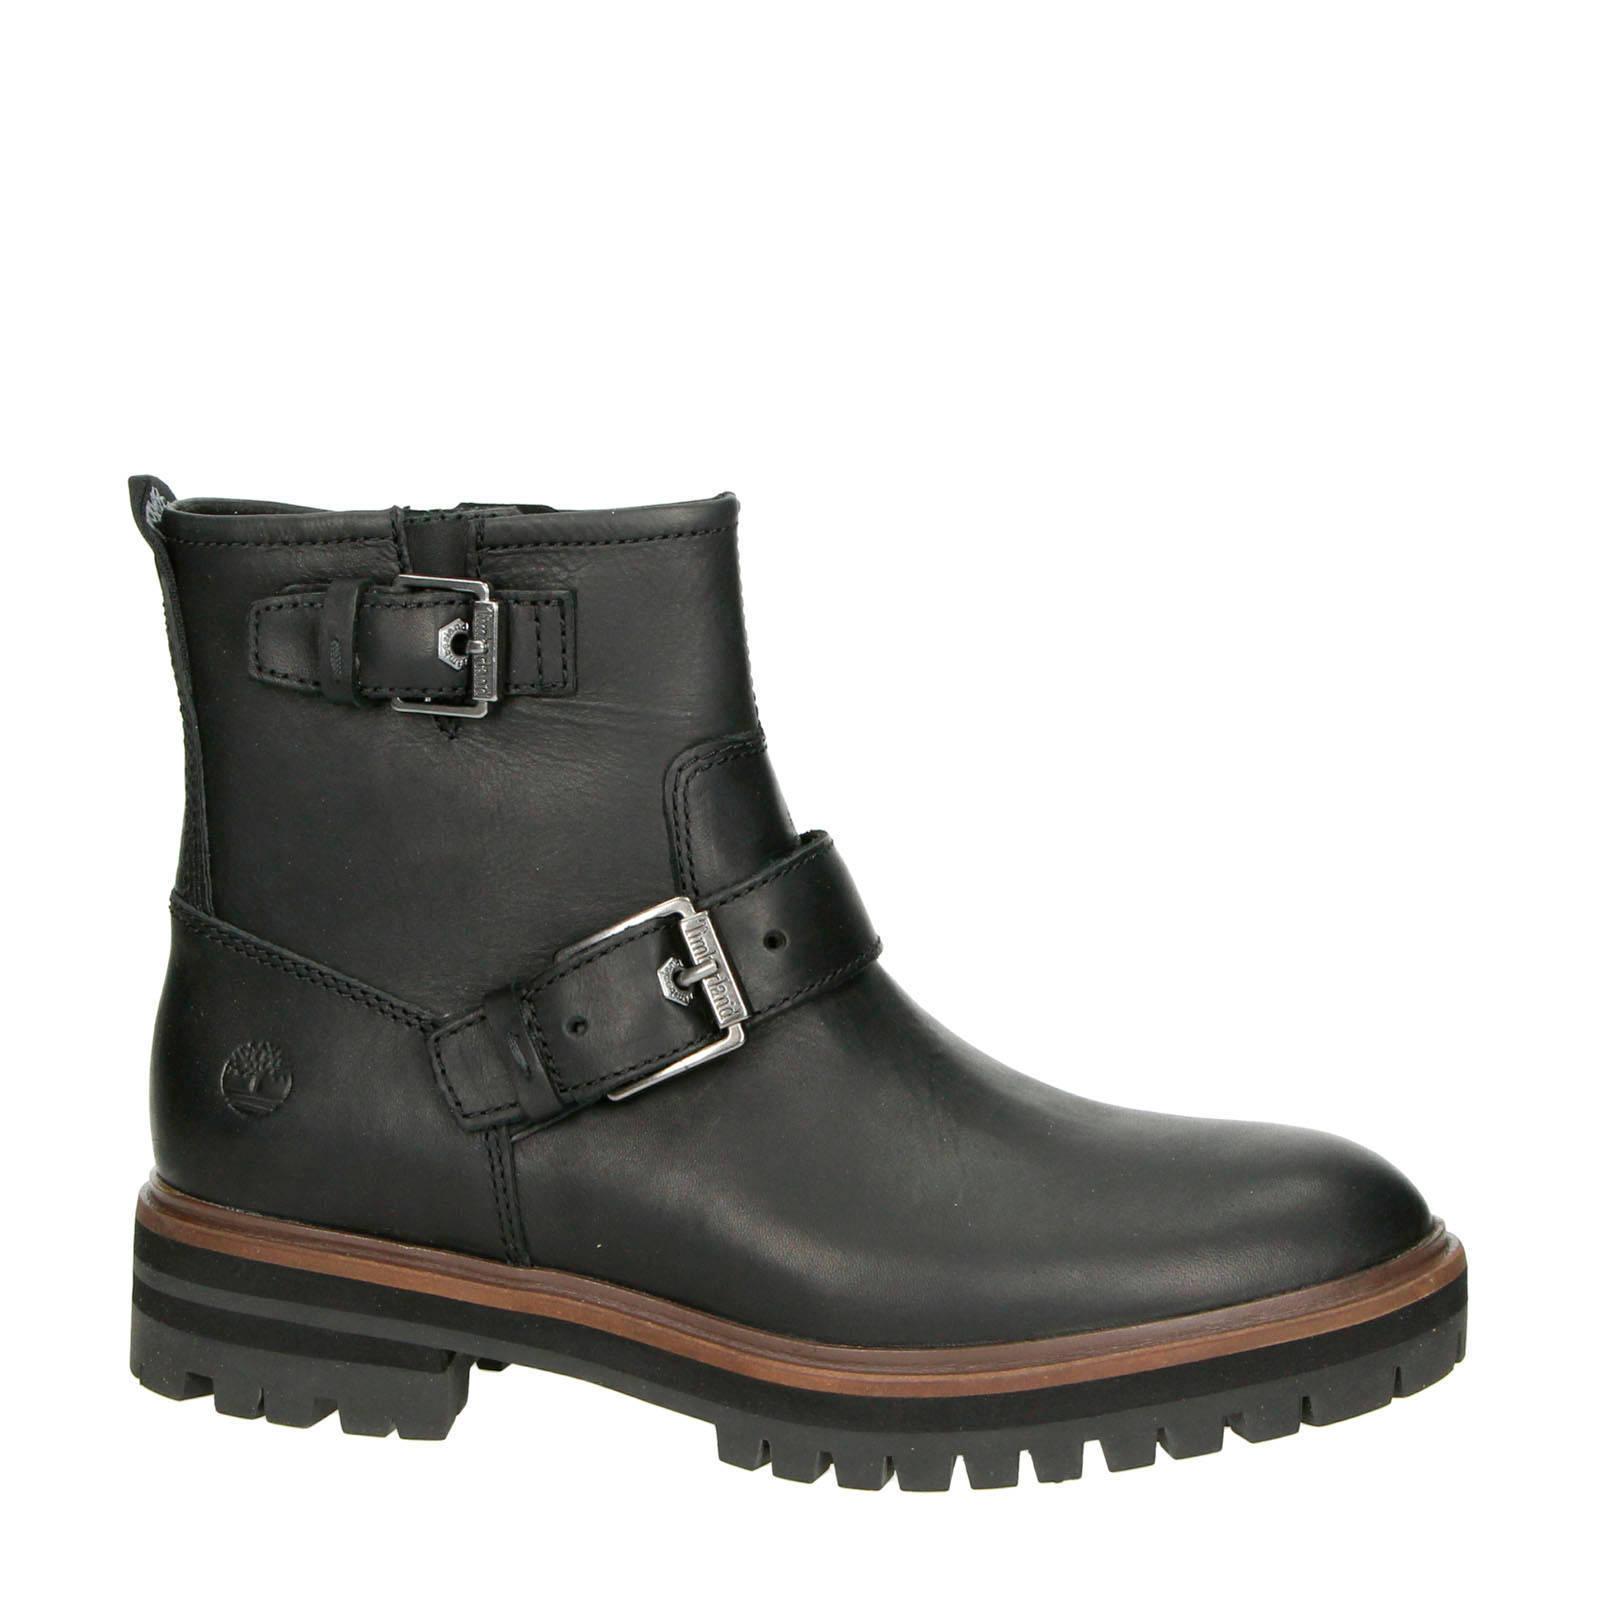 Timberland dames boots bij wehkamp Gratis bezorging vanaf 20.